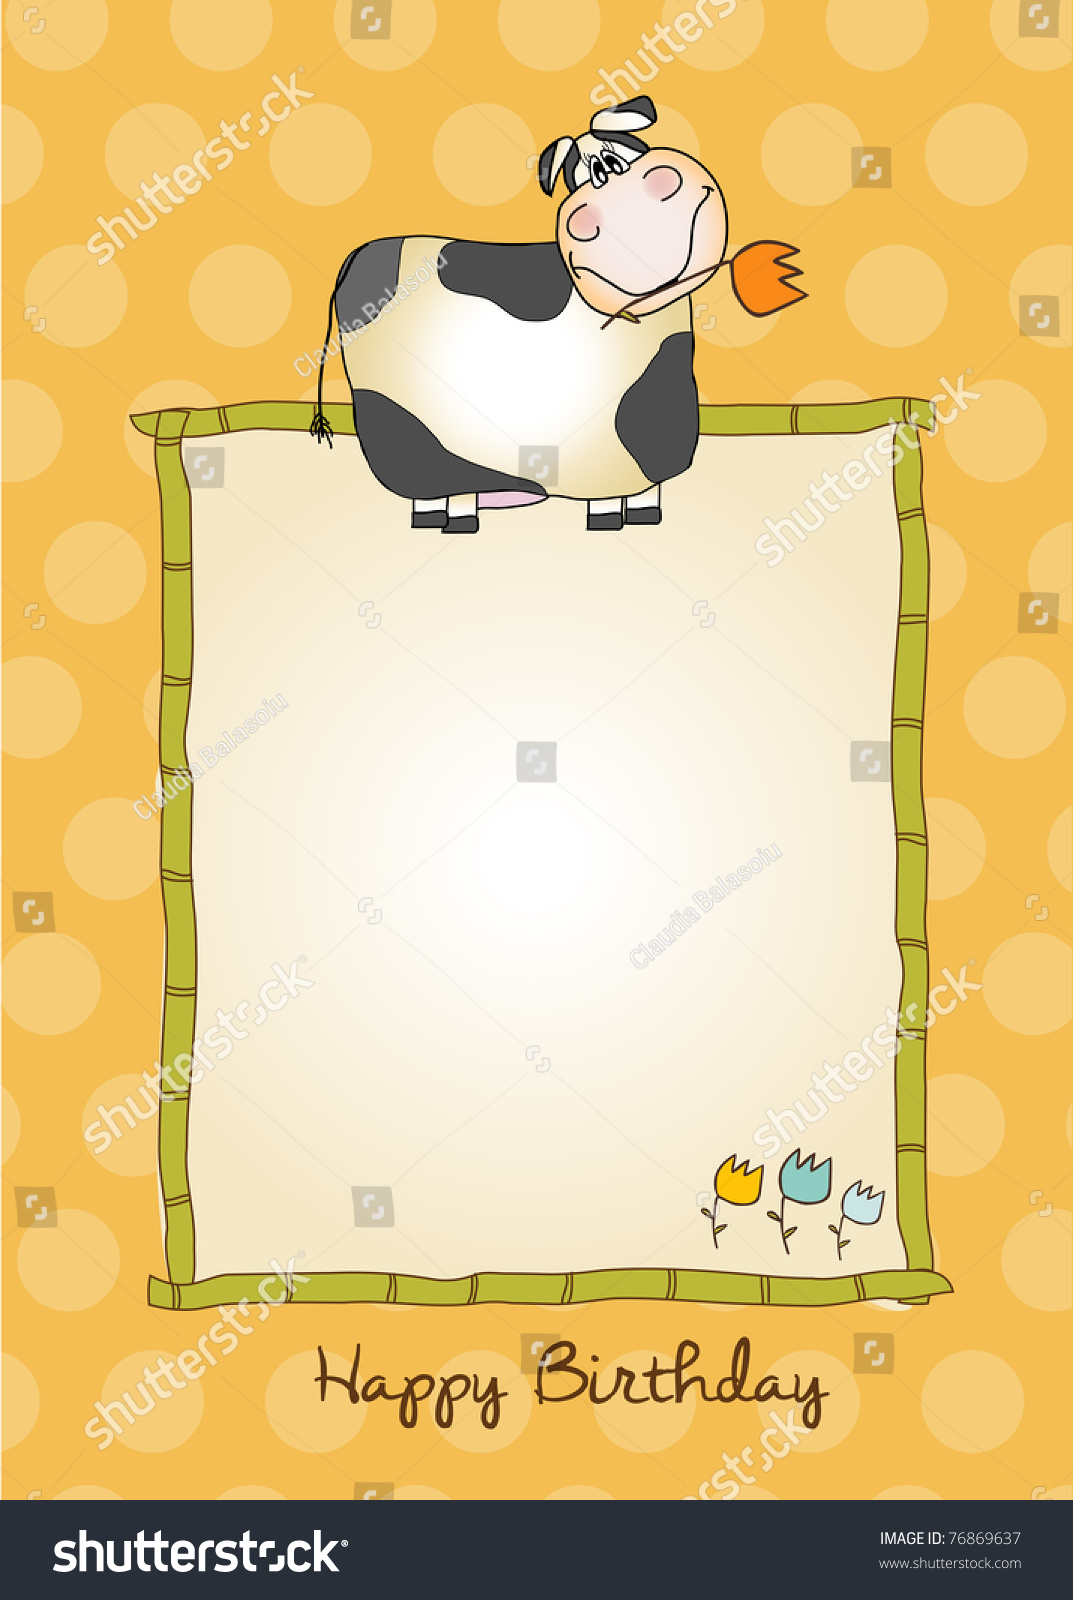 Baby Shower Invitation Stock Vector 76869637 - Shutterstock